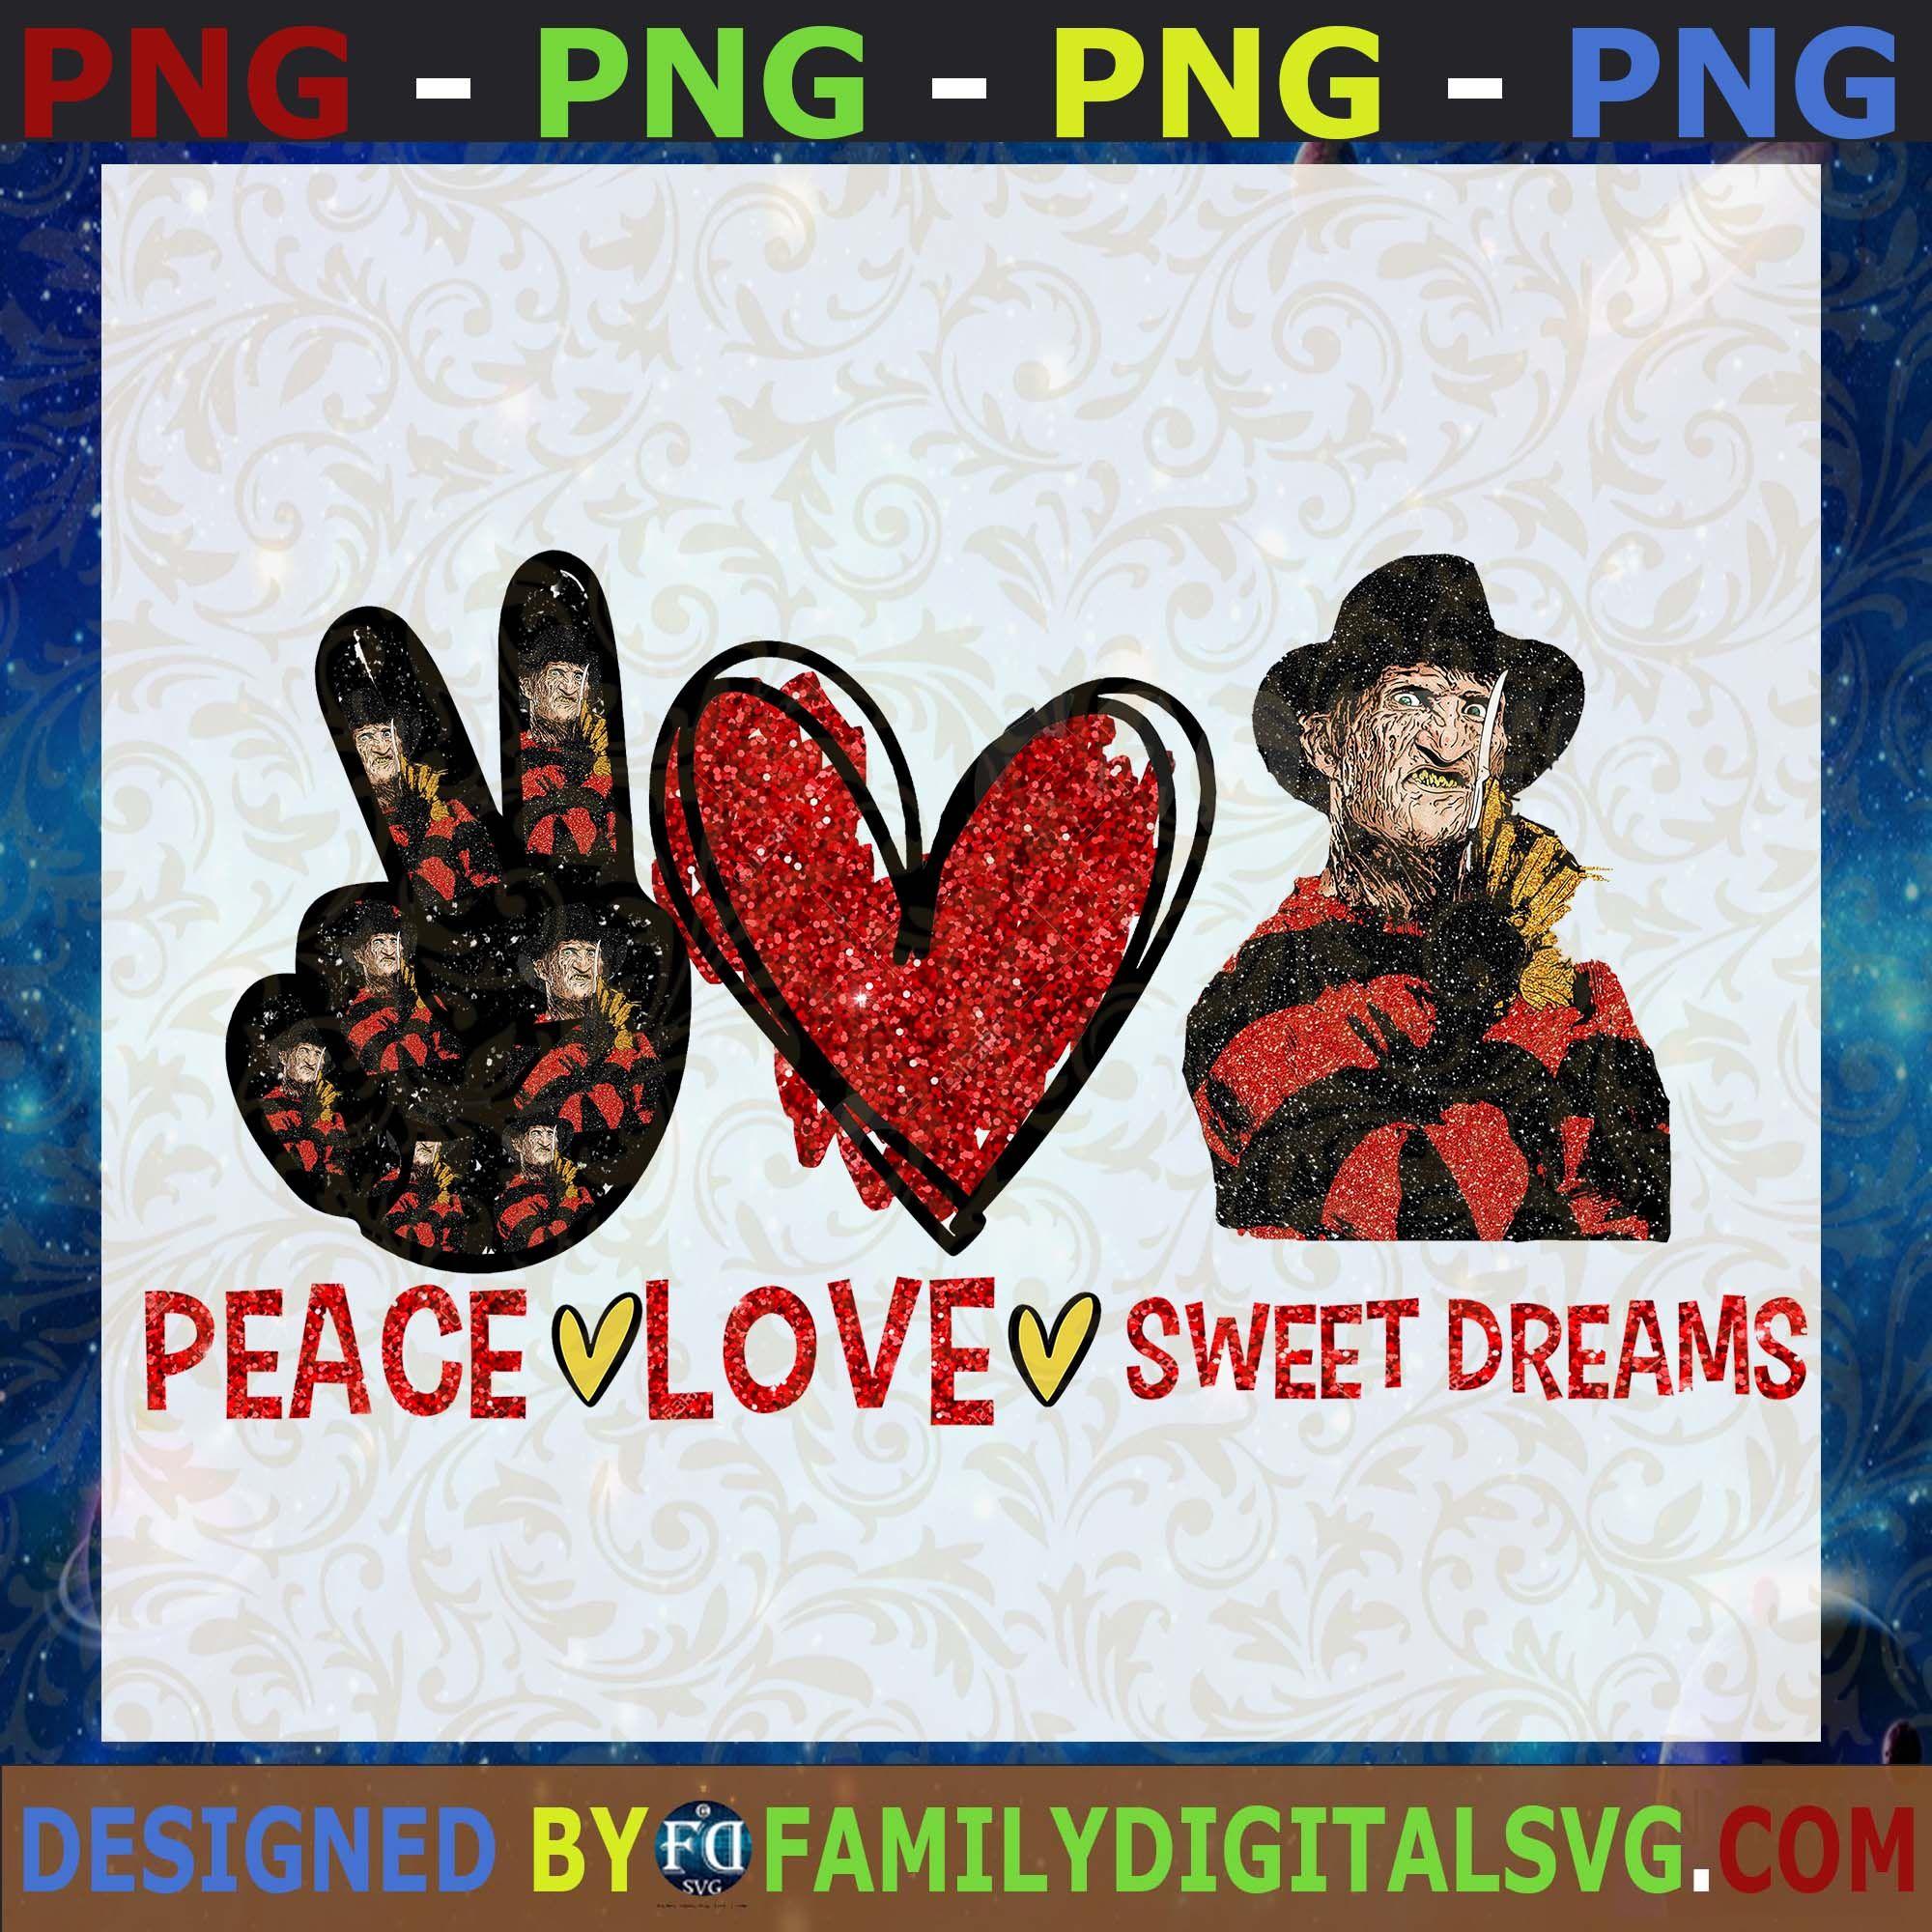 Peace Love Sweet Dreams Freddy Krueger Png Digital Download For Sublimation Or Screens Svg Peace And Love Digital Download Sweet Dreams